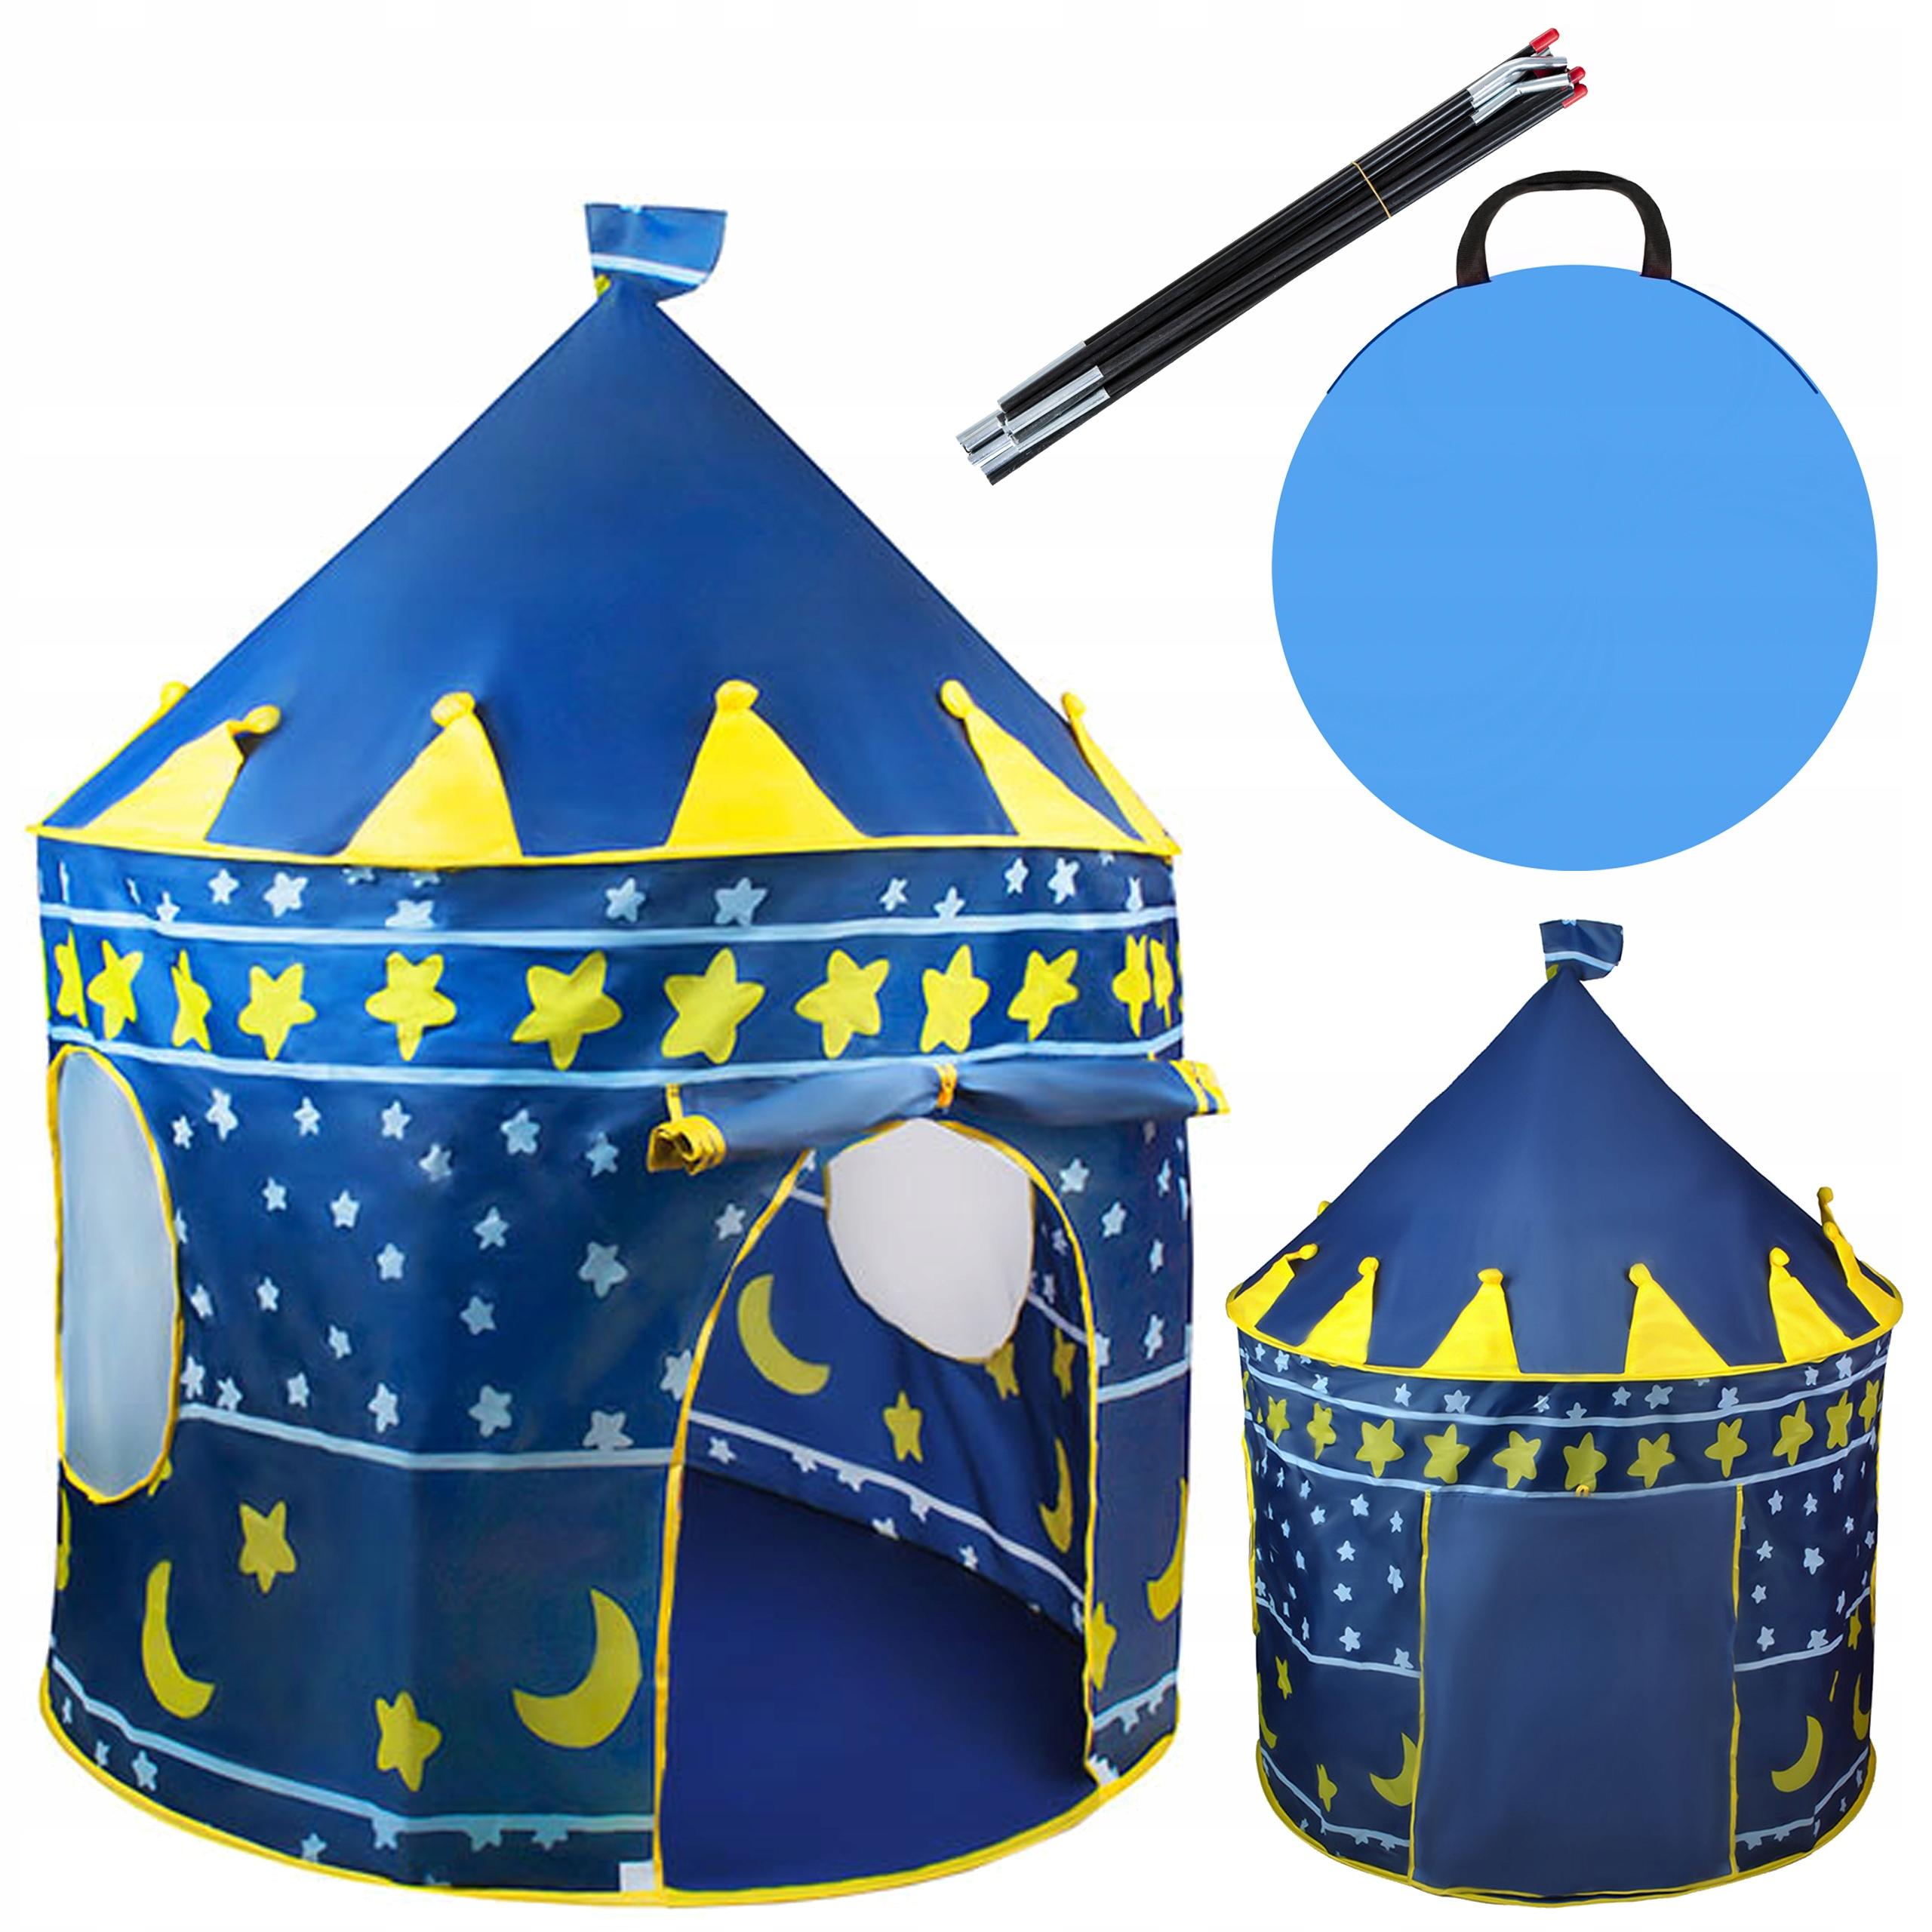 Дом-шатер для детей Дворец Замковый Сад N